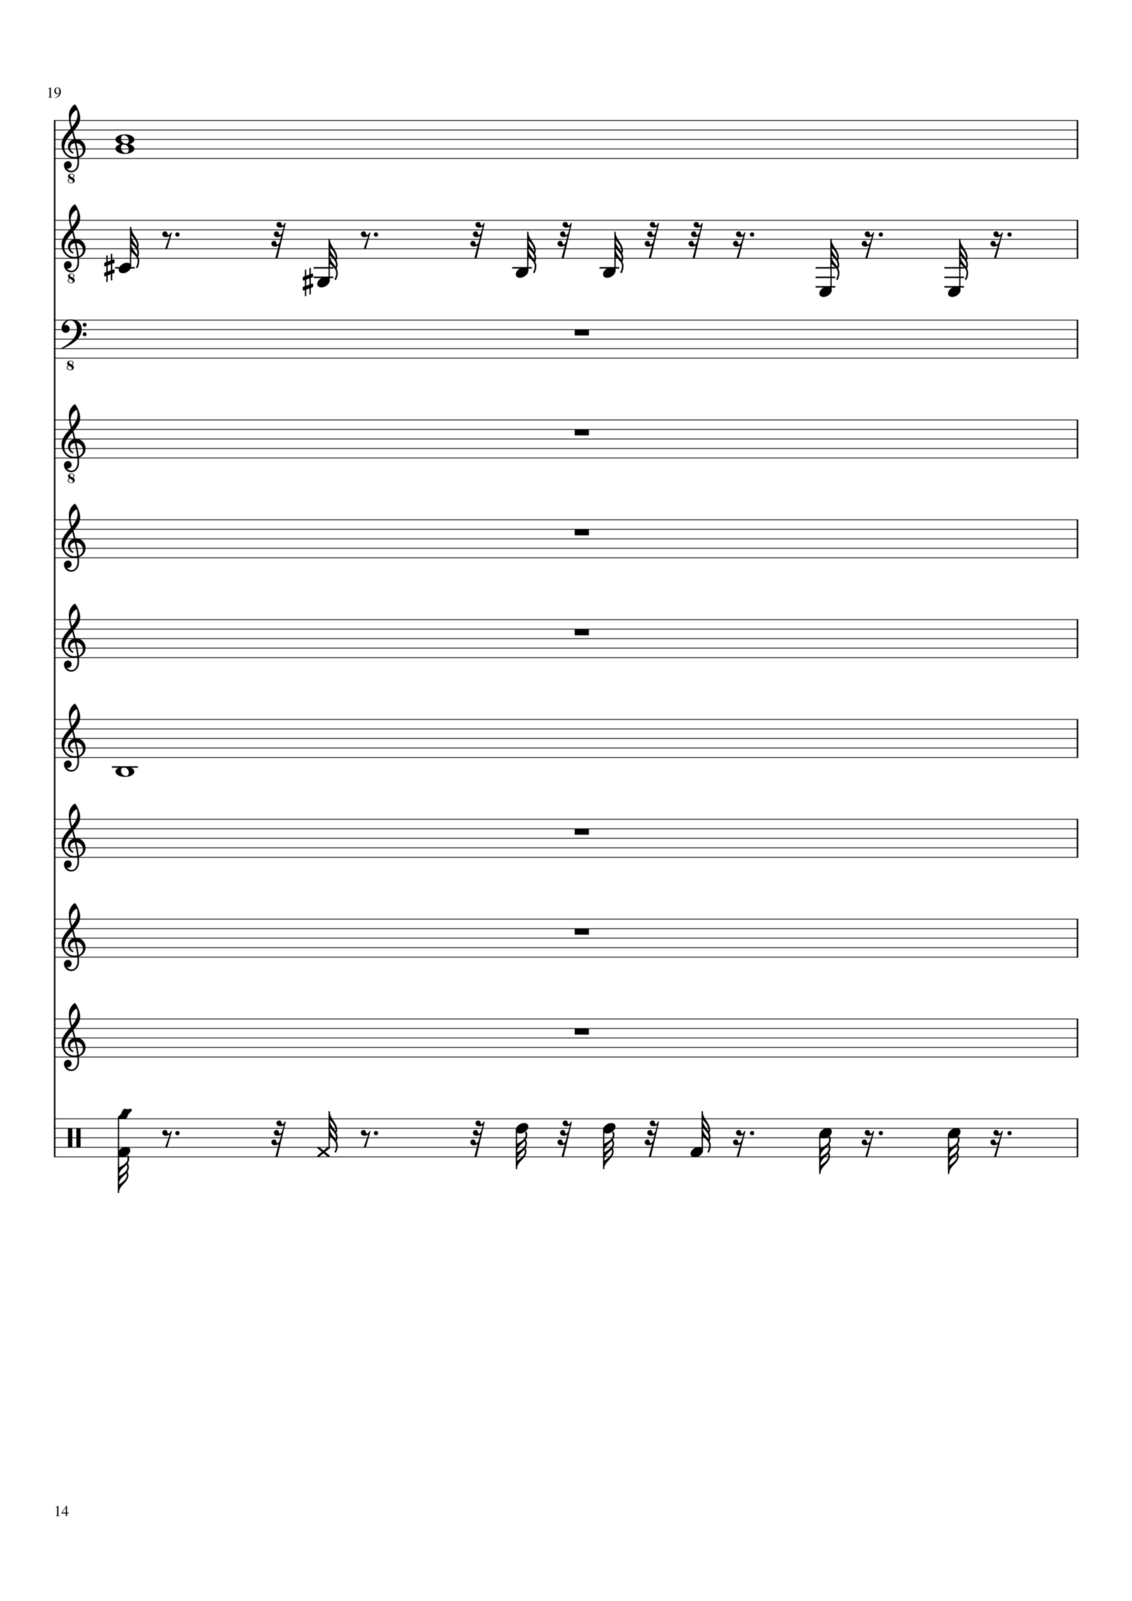 Belyiy sokol slide, Image 14